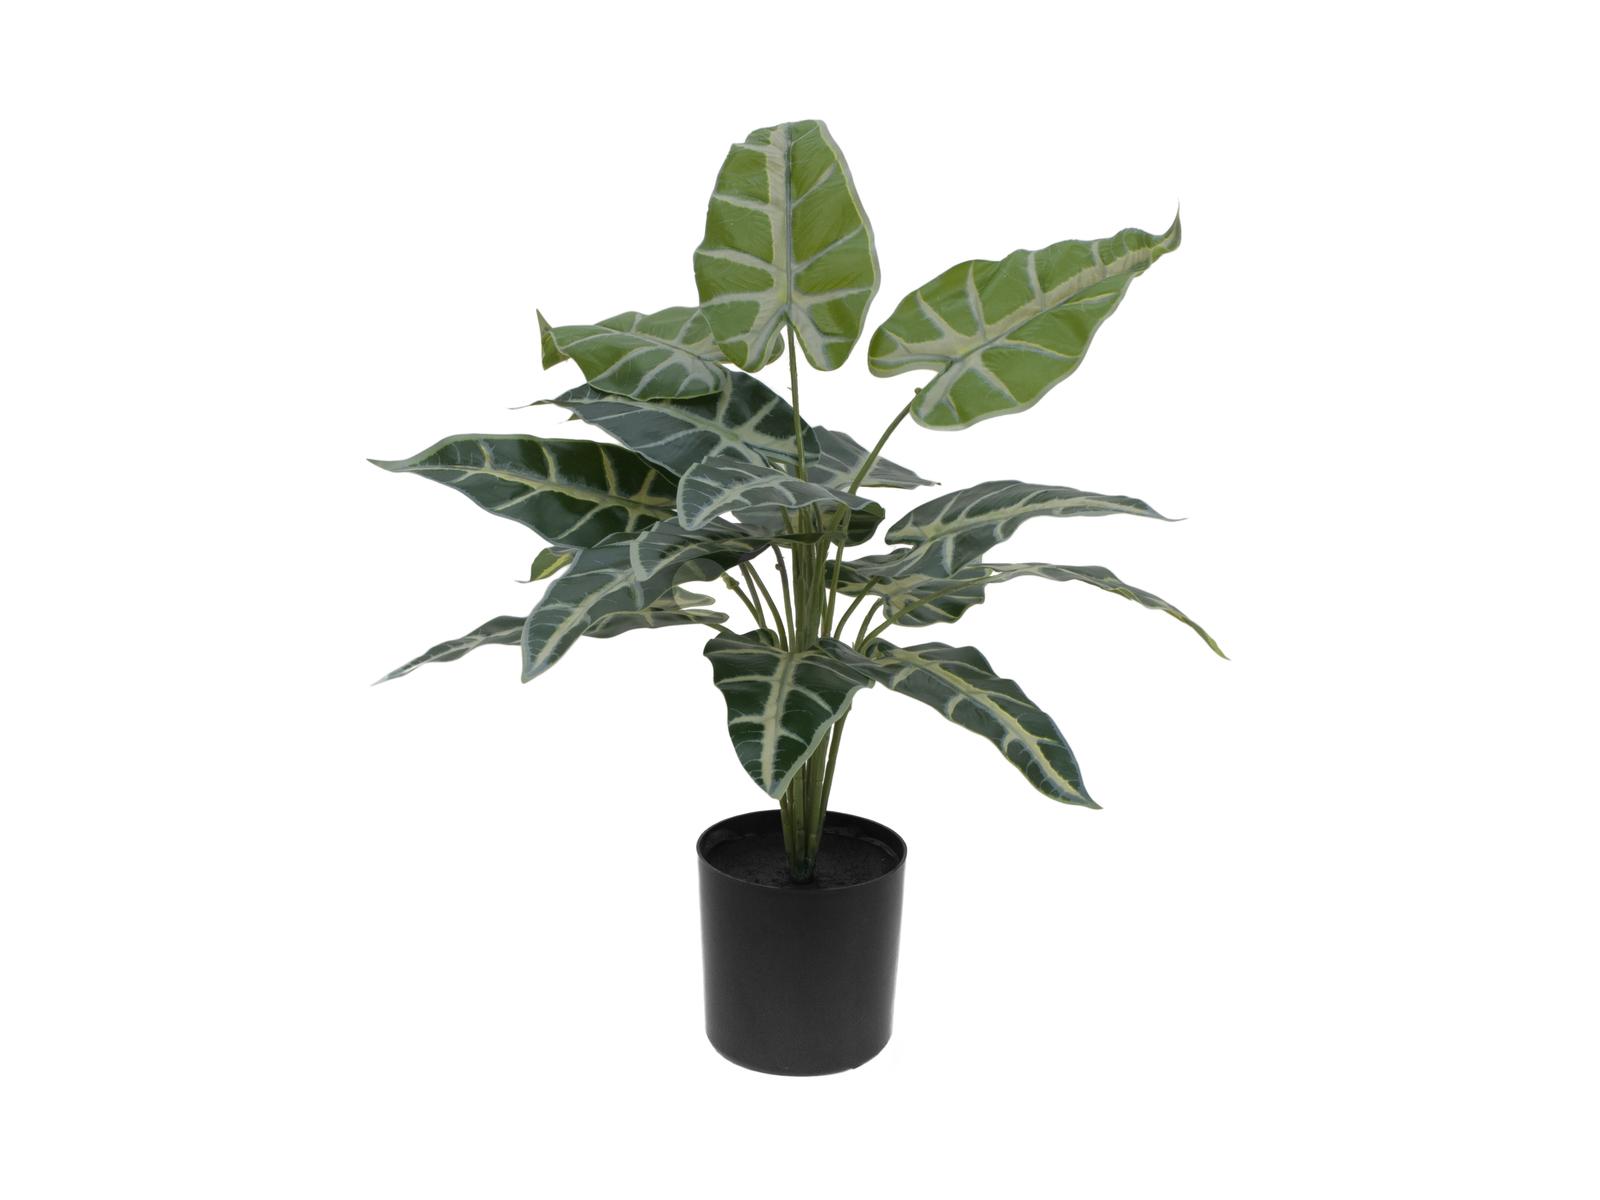 EUROPALMS Caladium, piante artificiali, 38cm